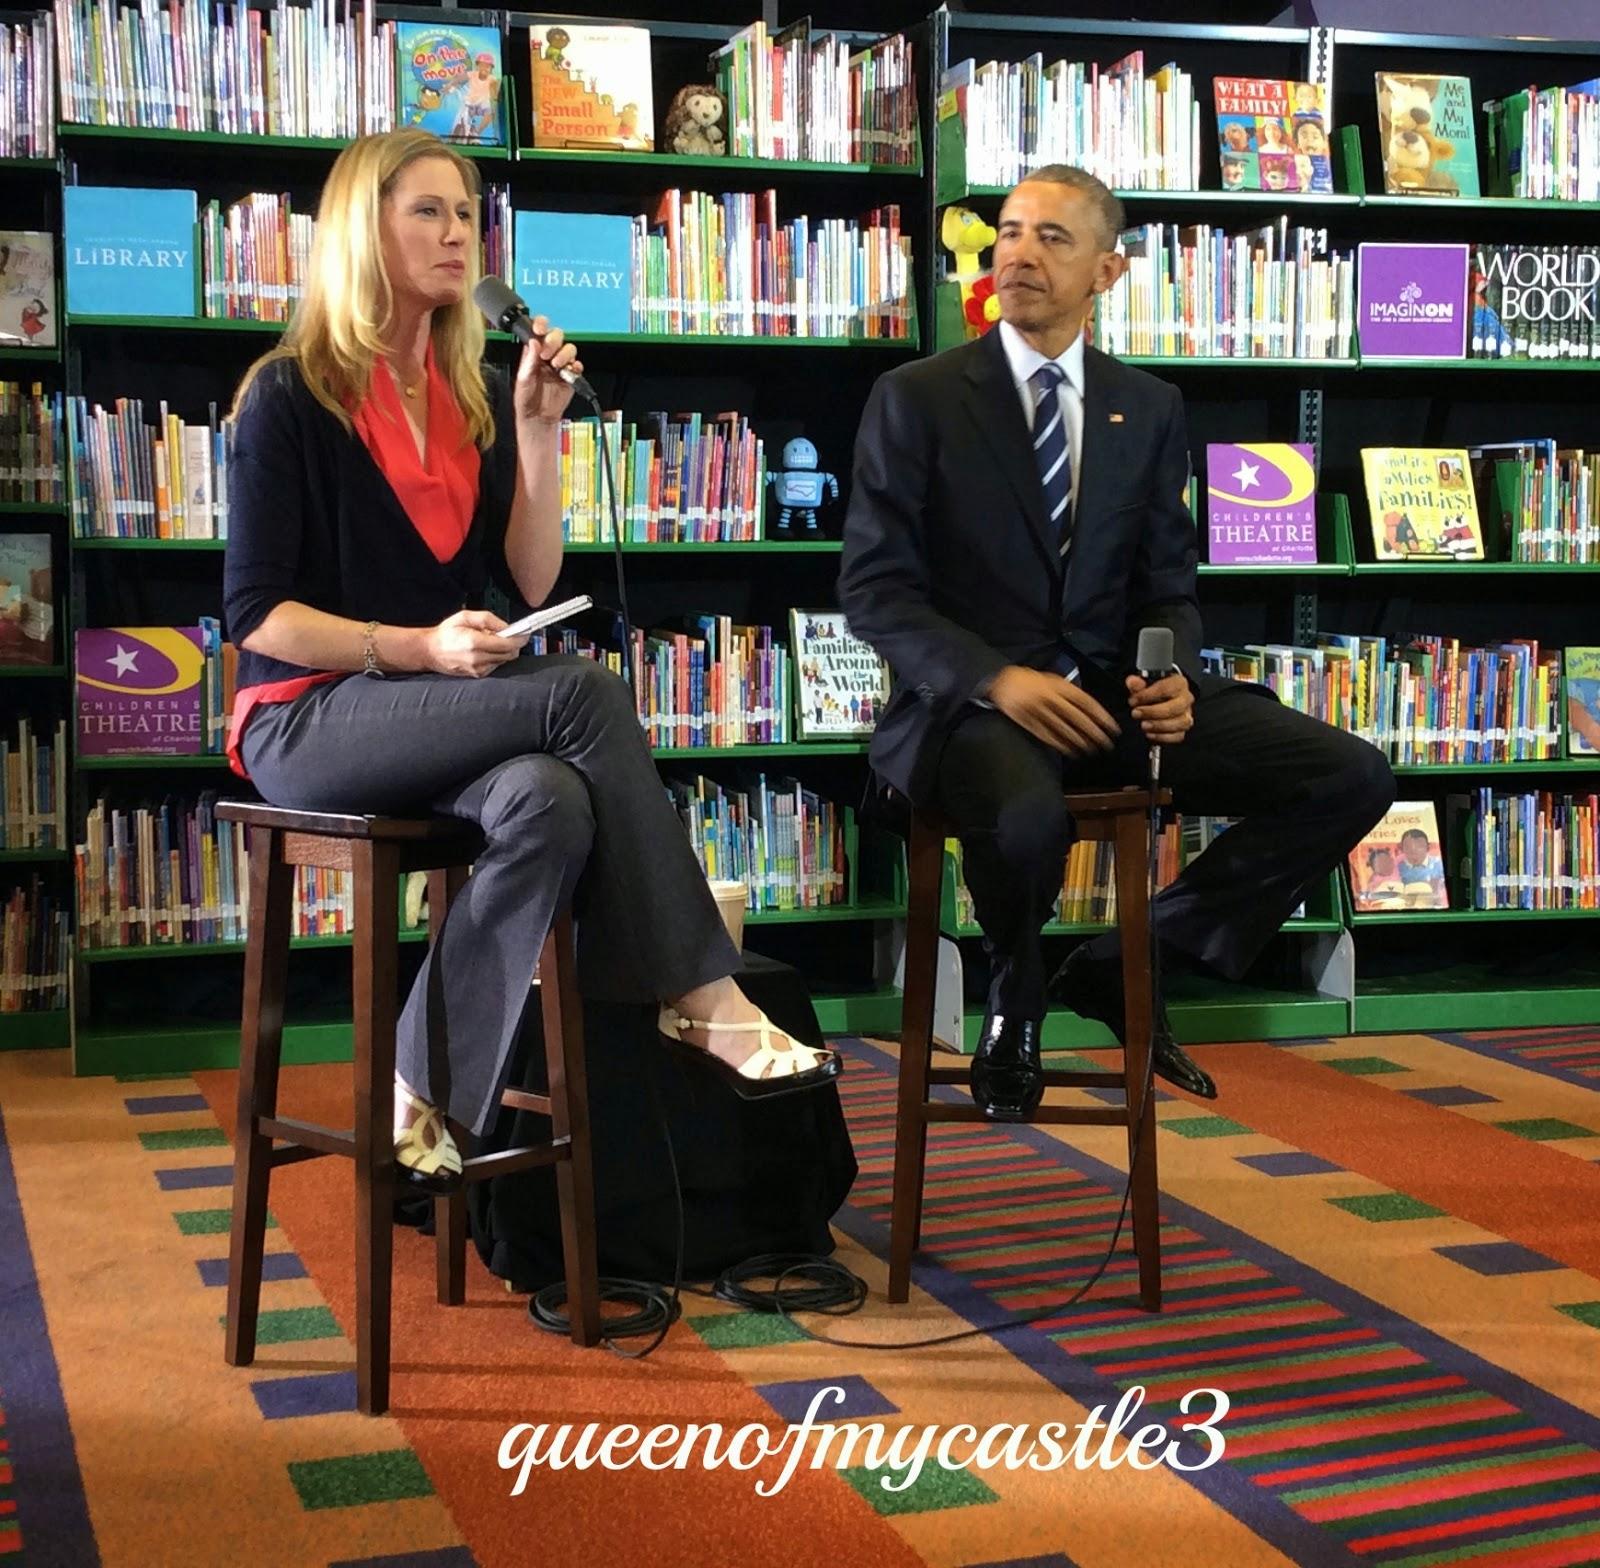 Lisa Stone interviews Barack Obama